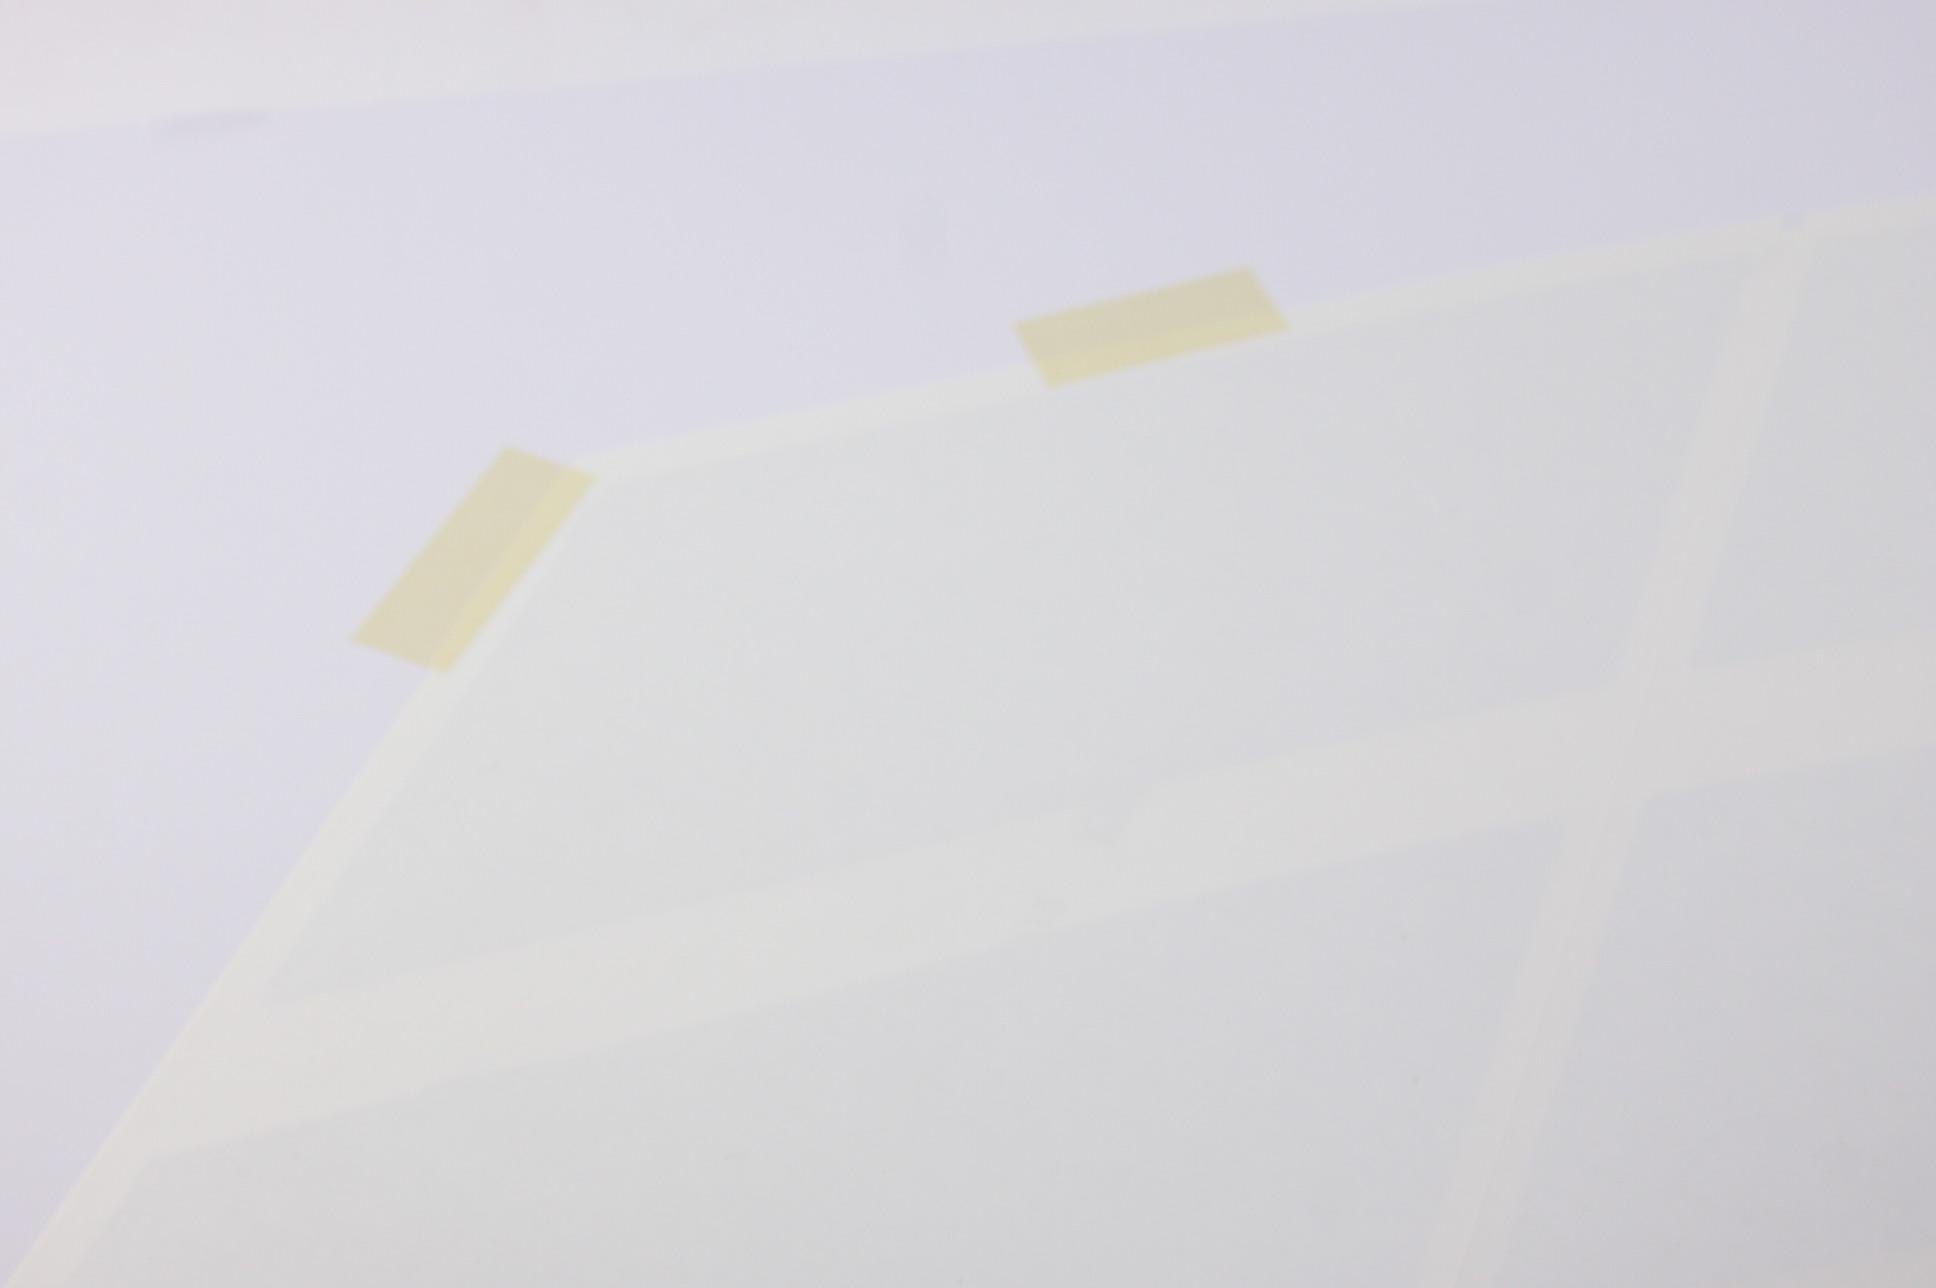 **~New Mopar OEM 1LW72PR4AA Dodge Challenger Applique Decal Body Stripes Right - image 3